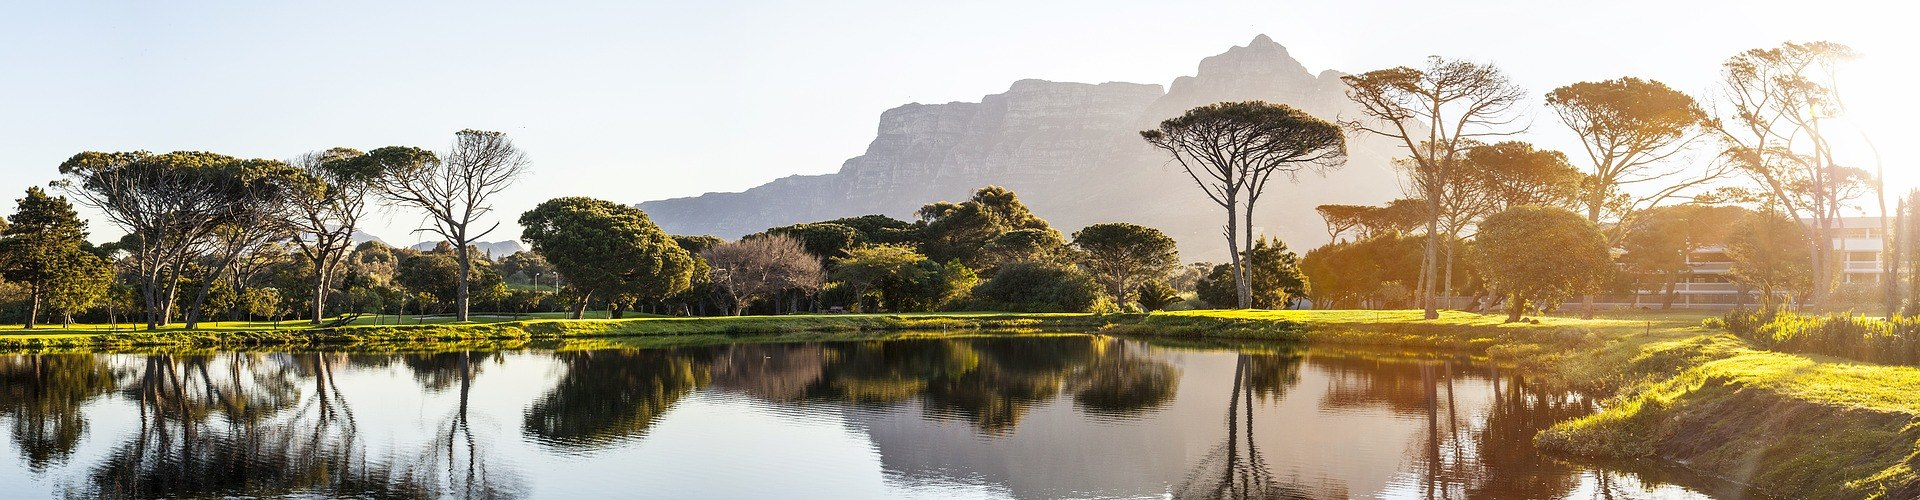 Reisetipps zum Thema: Südafrika